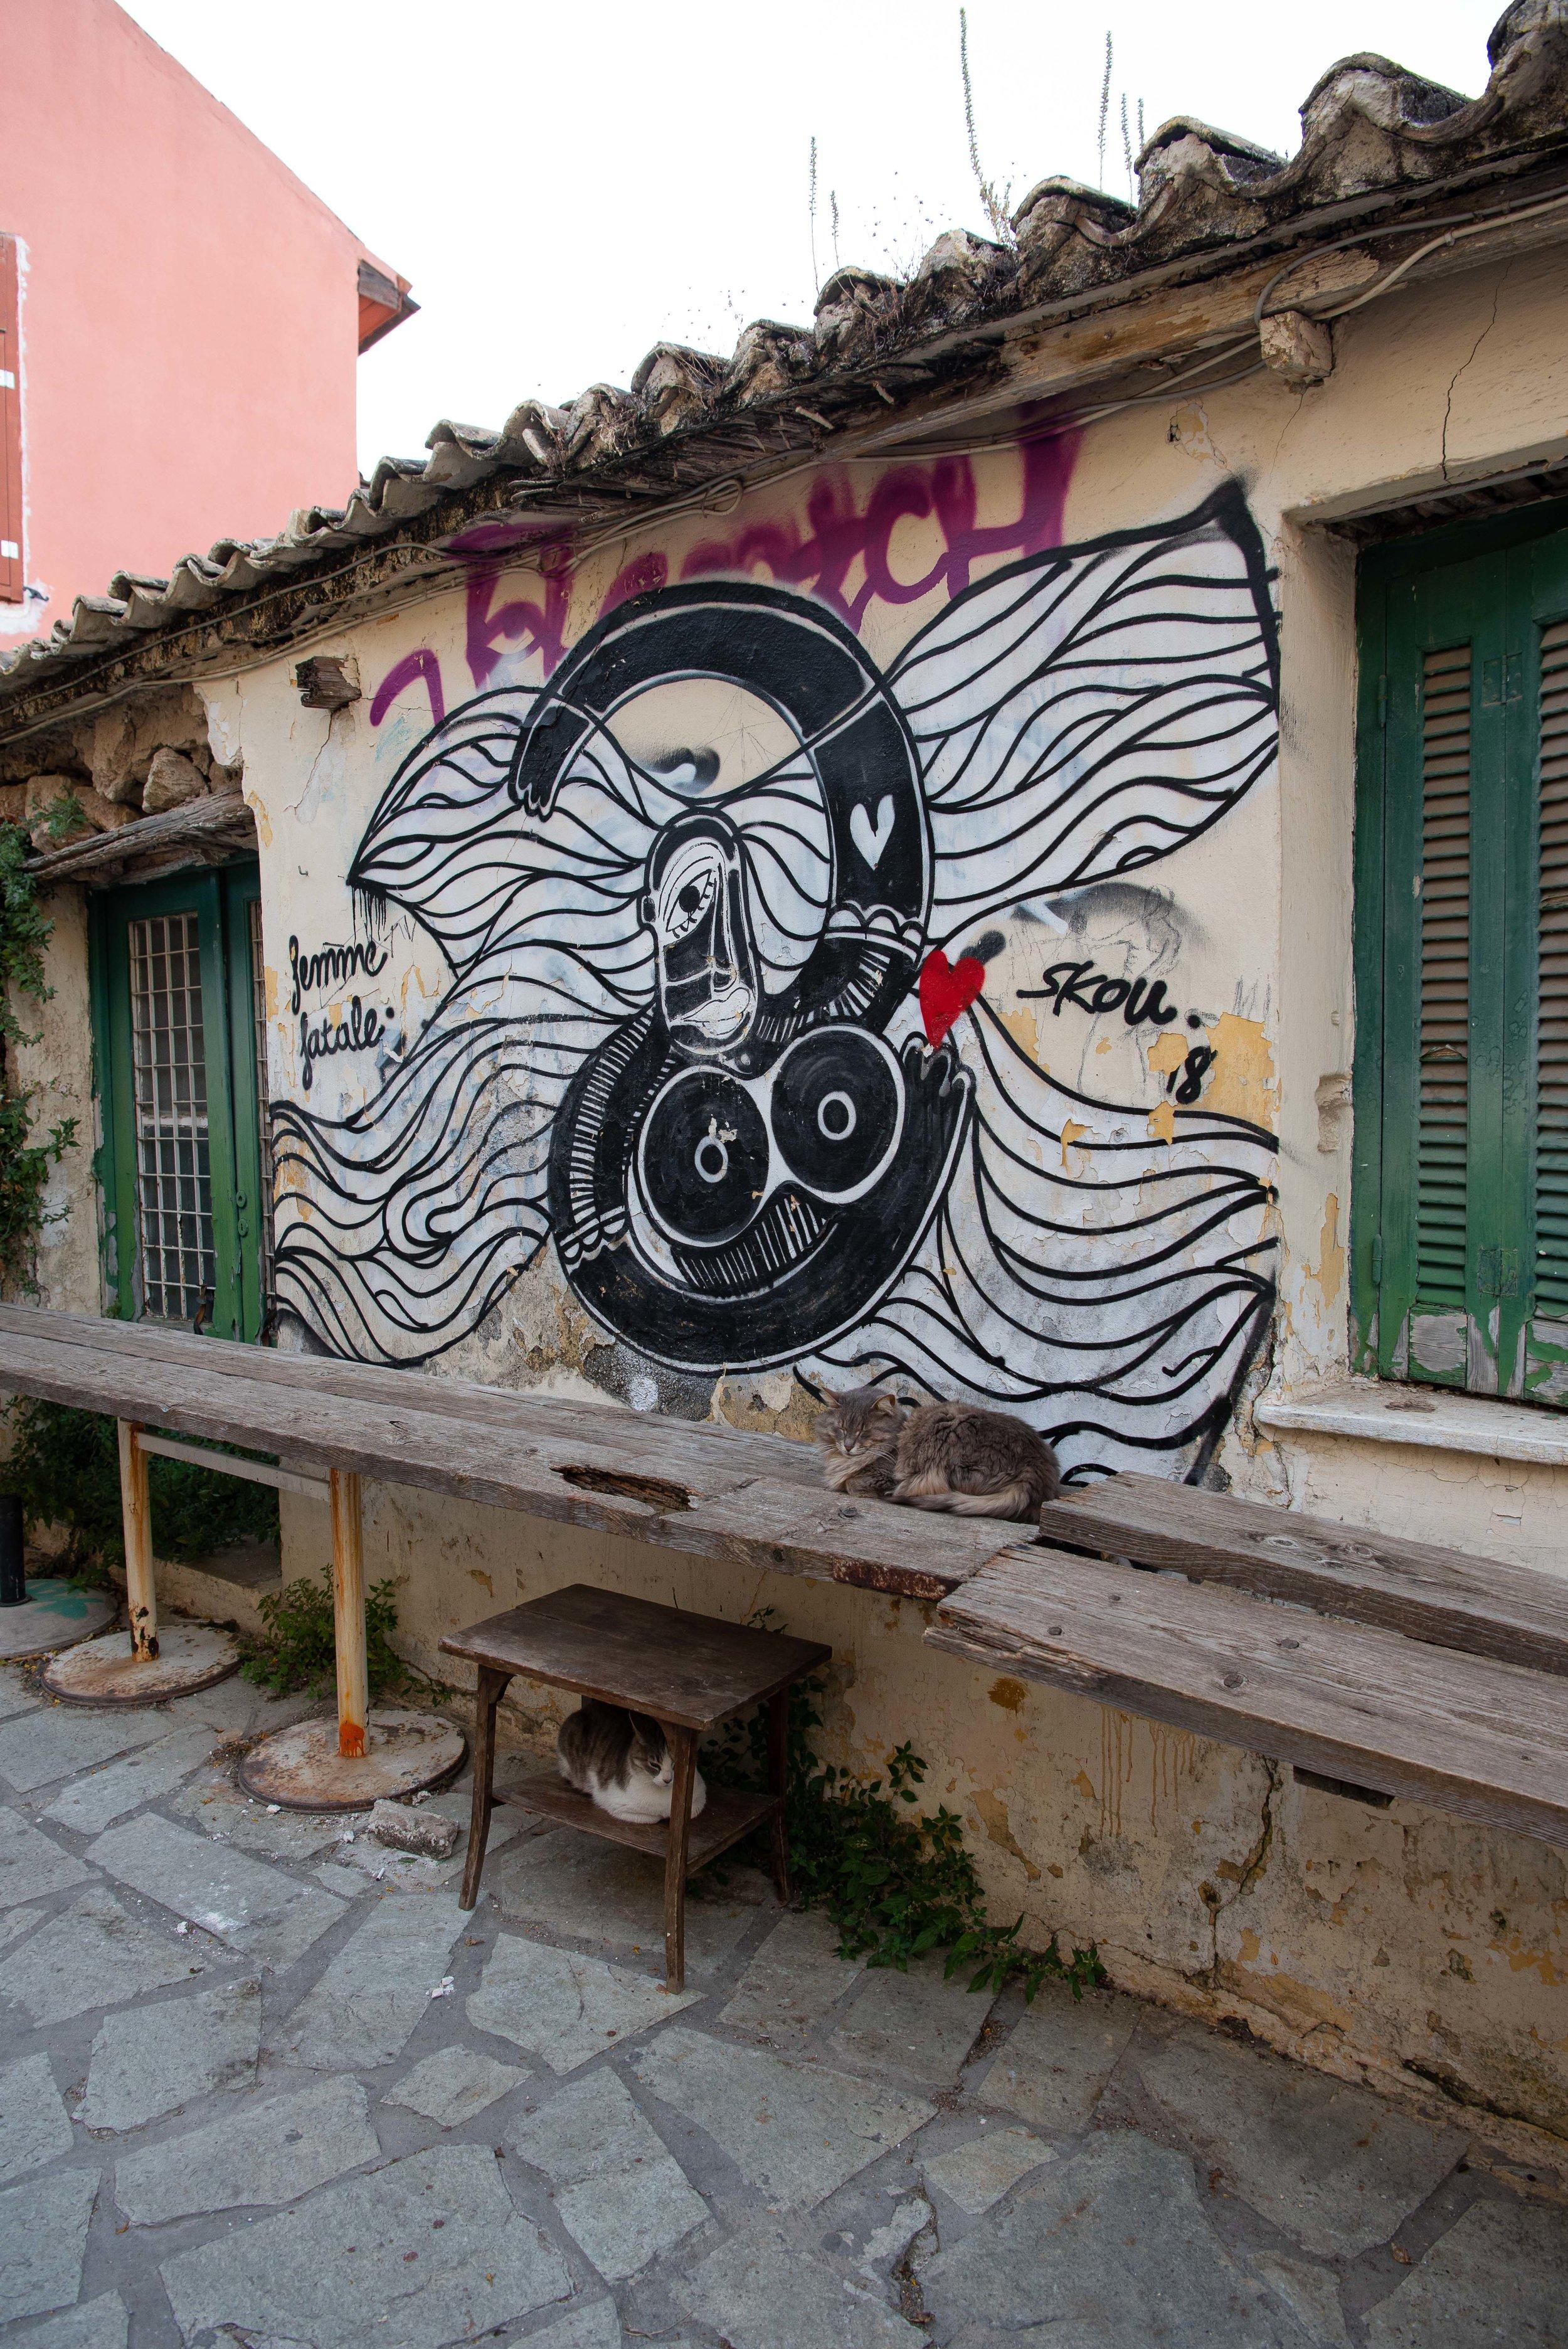 2019-May-14-Athens-Greece-198.jpg